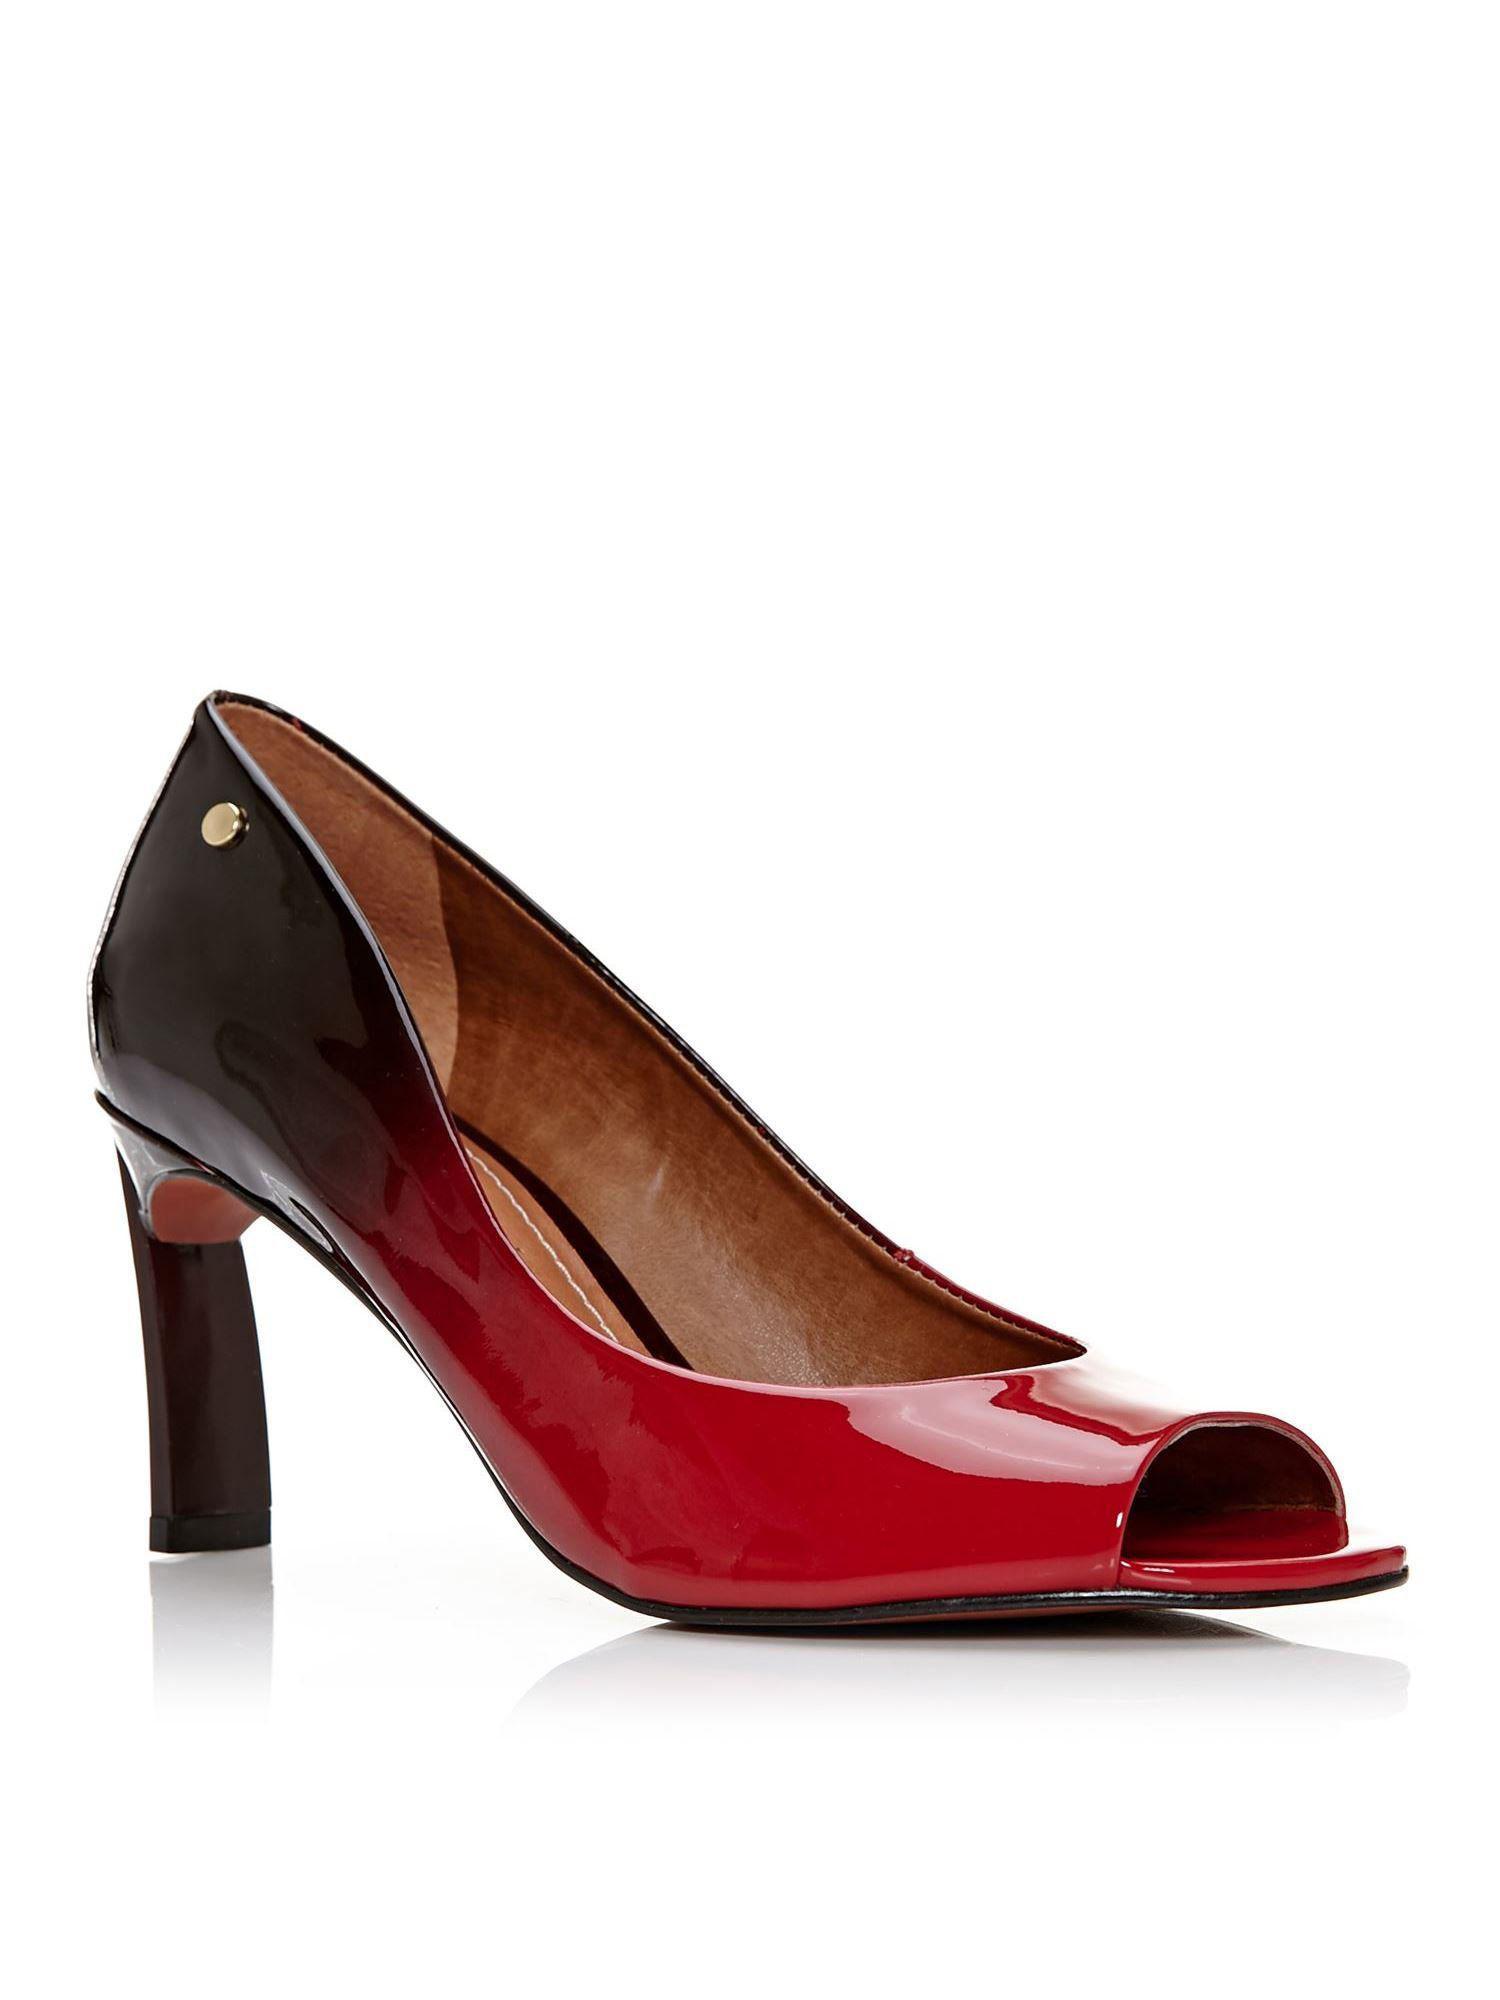 21559db9858 Moda In Pelle Camdoni Medium Smart Shoes in Blue - Lyst